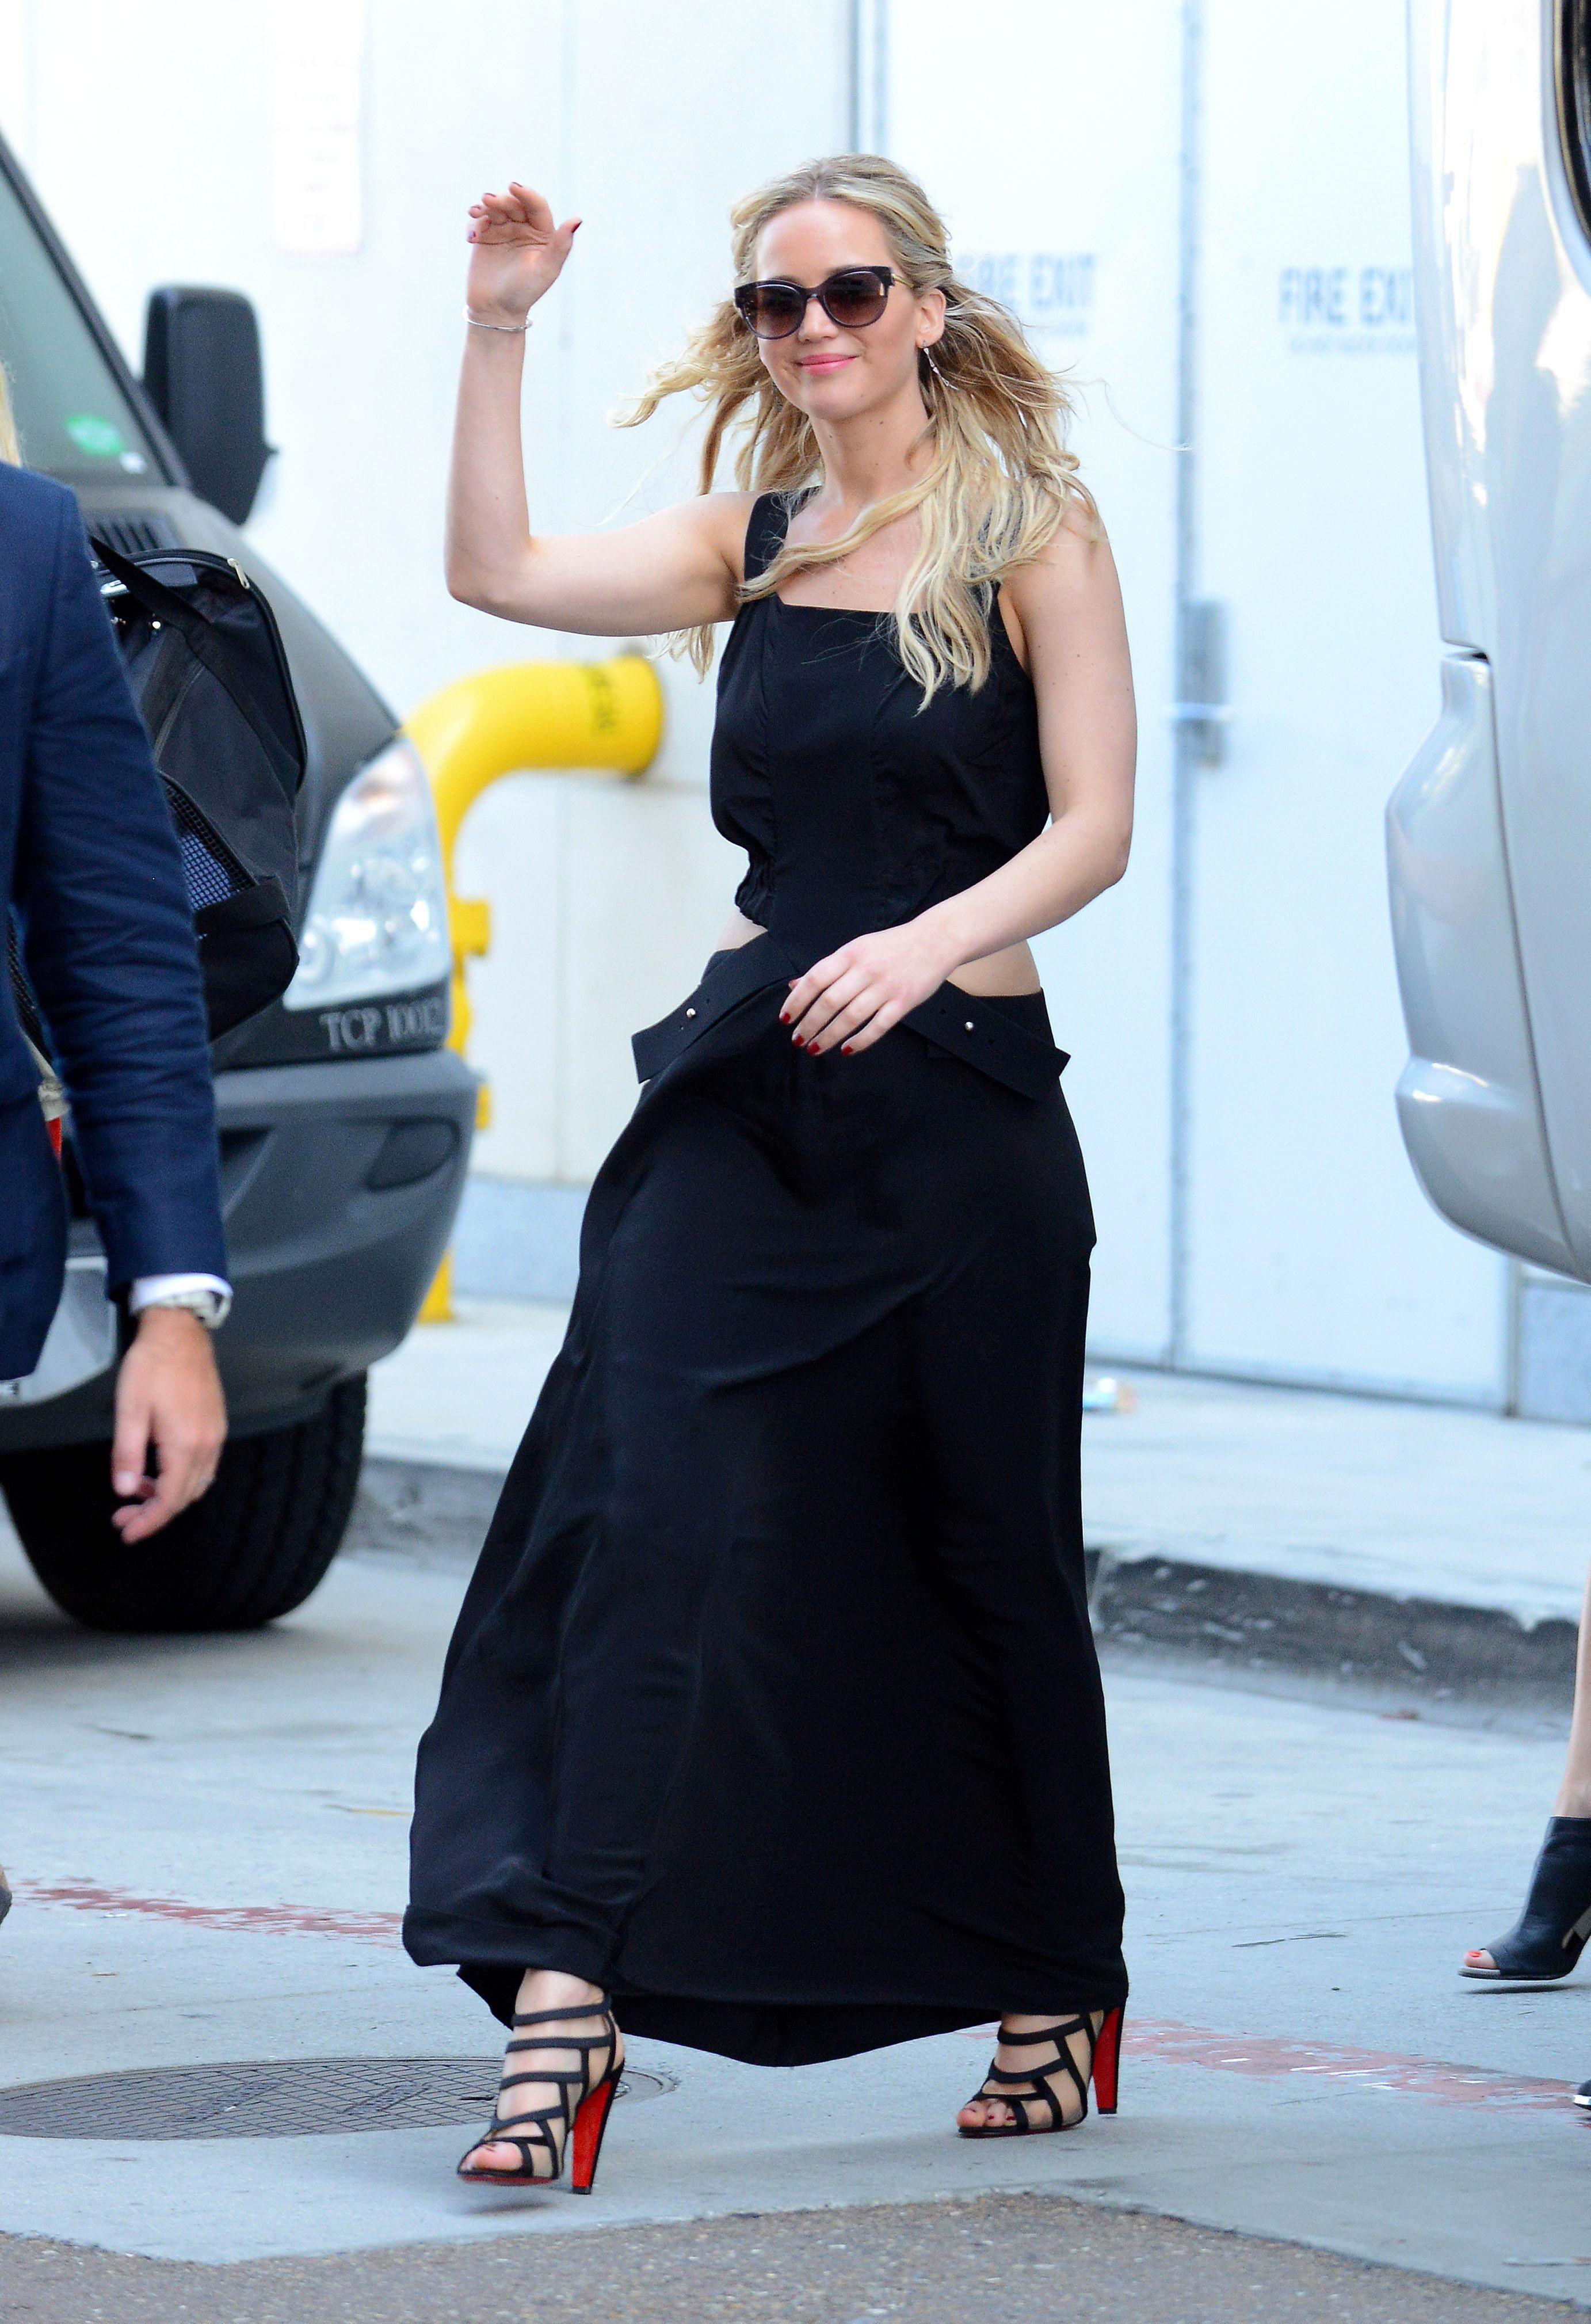 10 Reasons Fans Love Jennifer Lawrence - Fame10